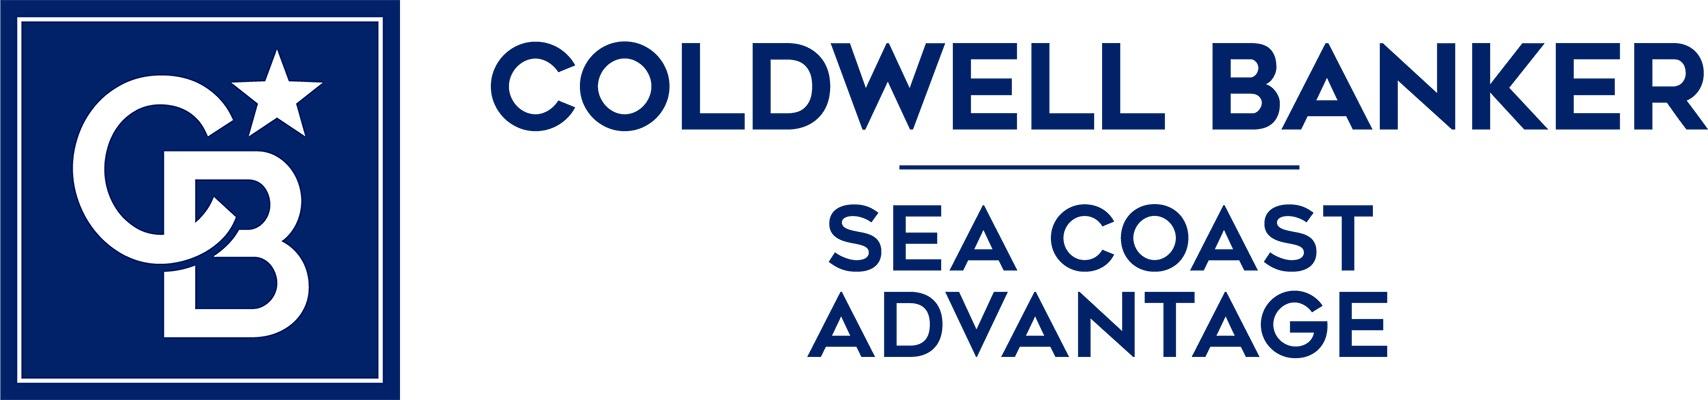 Jim Blair - Coldwell Banker Sea Coast Advantage Realty Logo